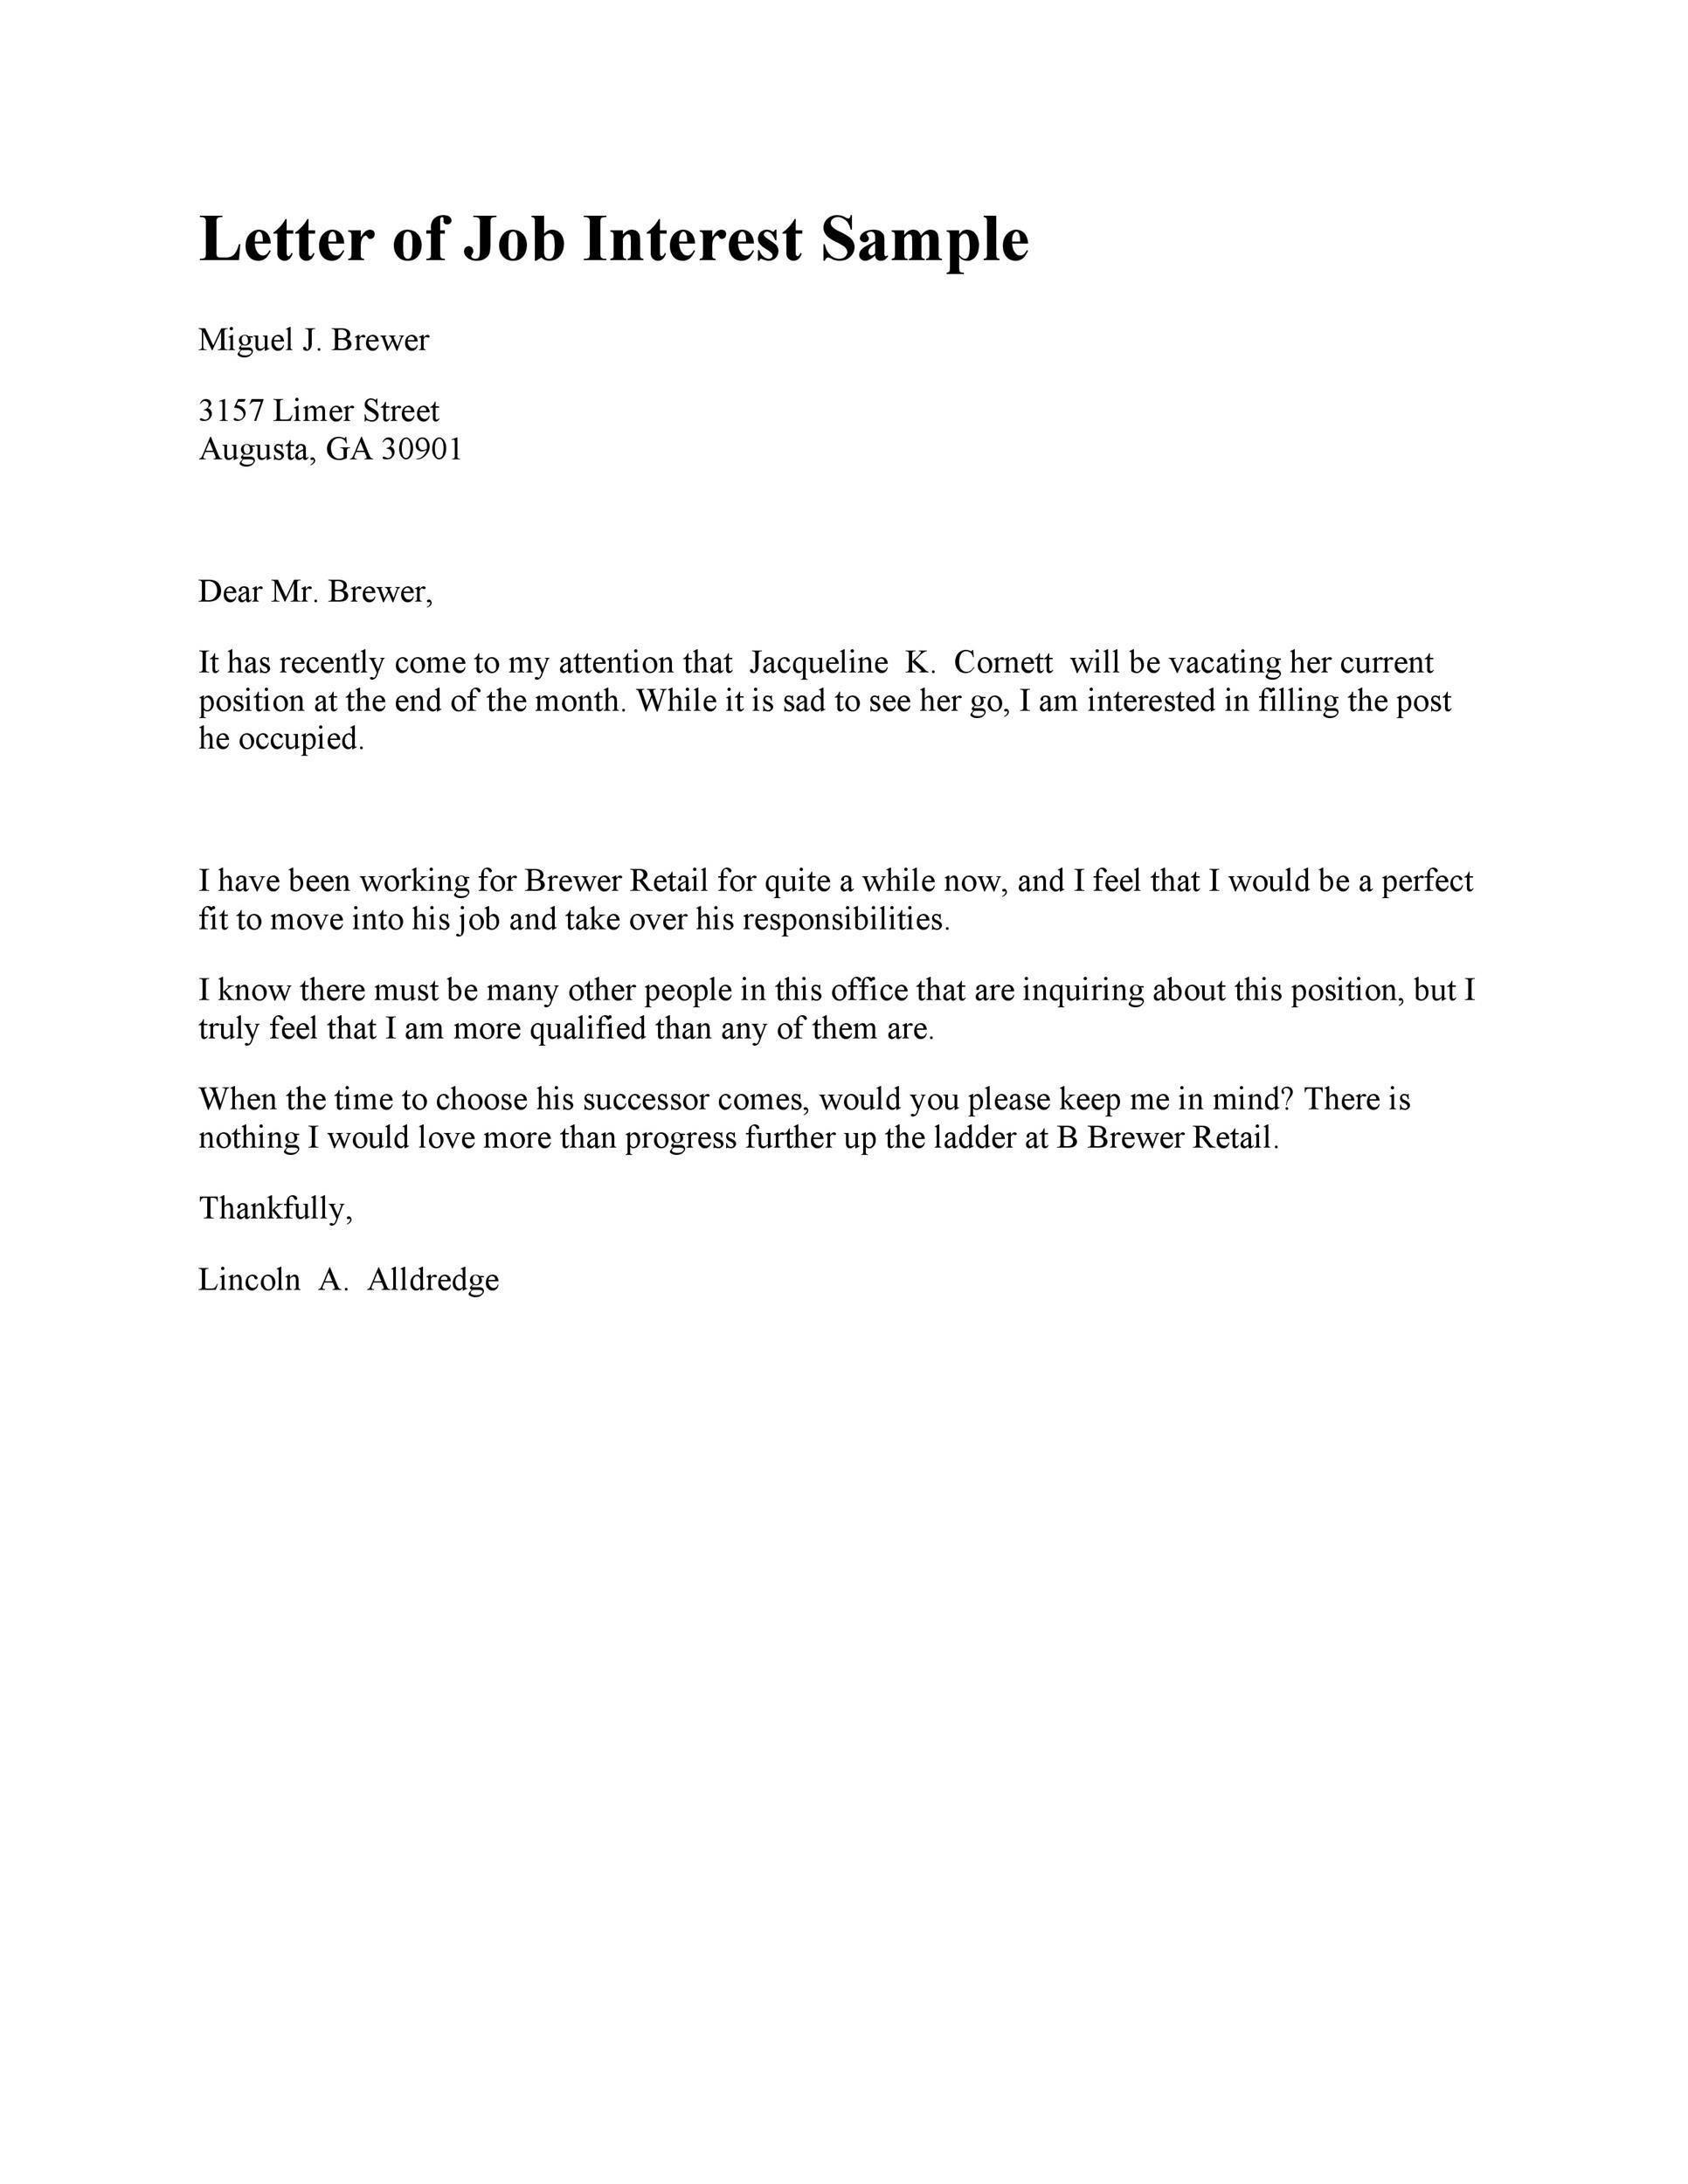 Free letter of interest 24